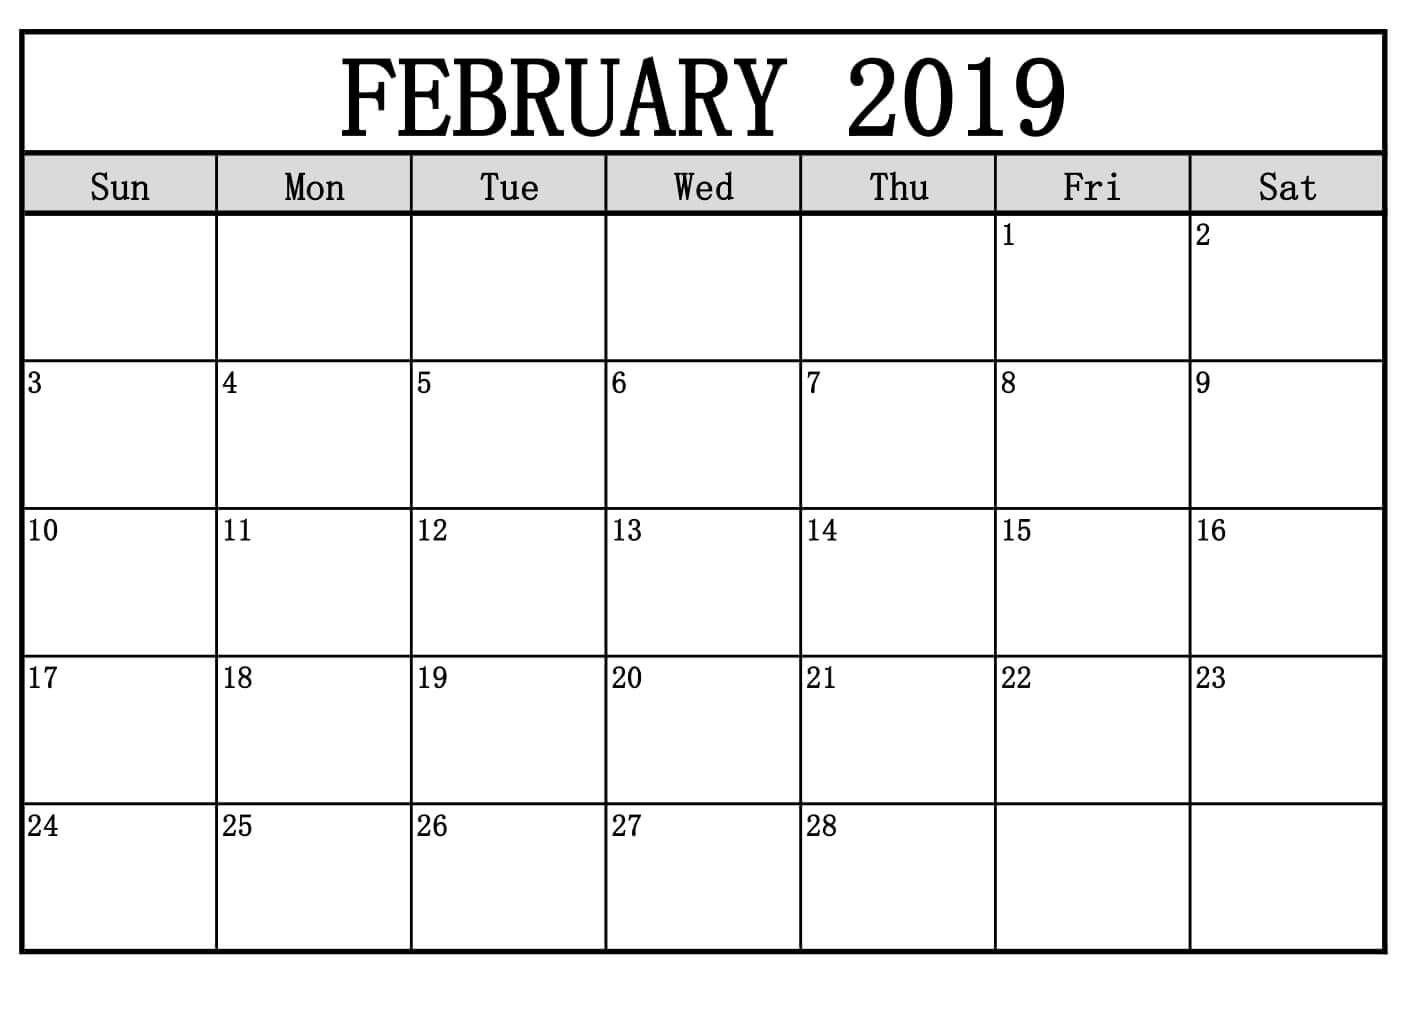 February 2019 Calendar Decorative Printable Blank Calendar Calendar Printables Printable Calendar Pdf